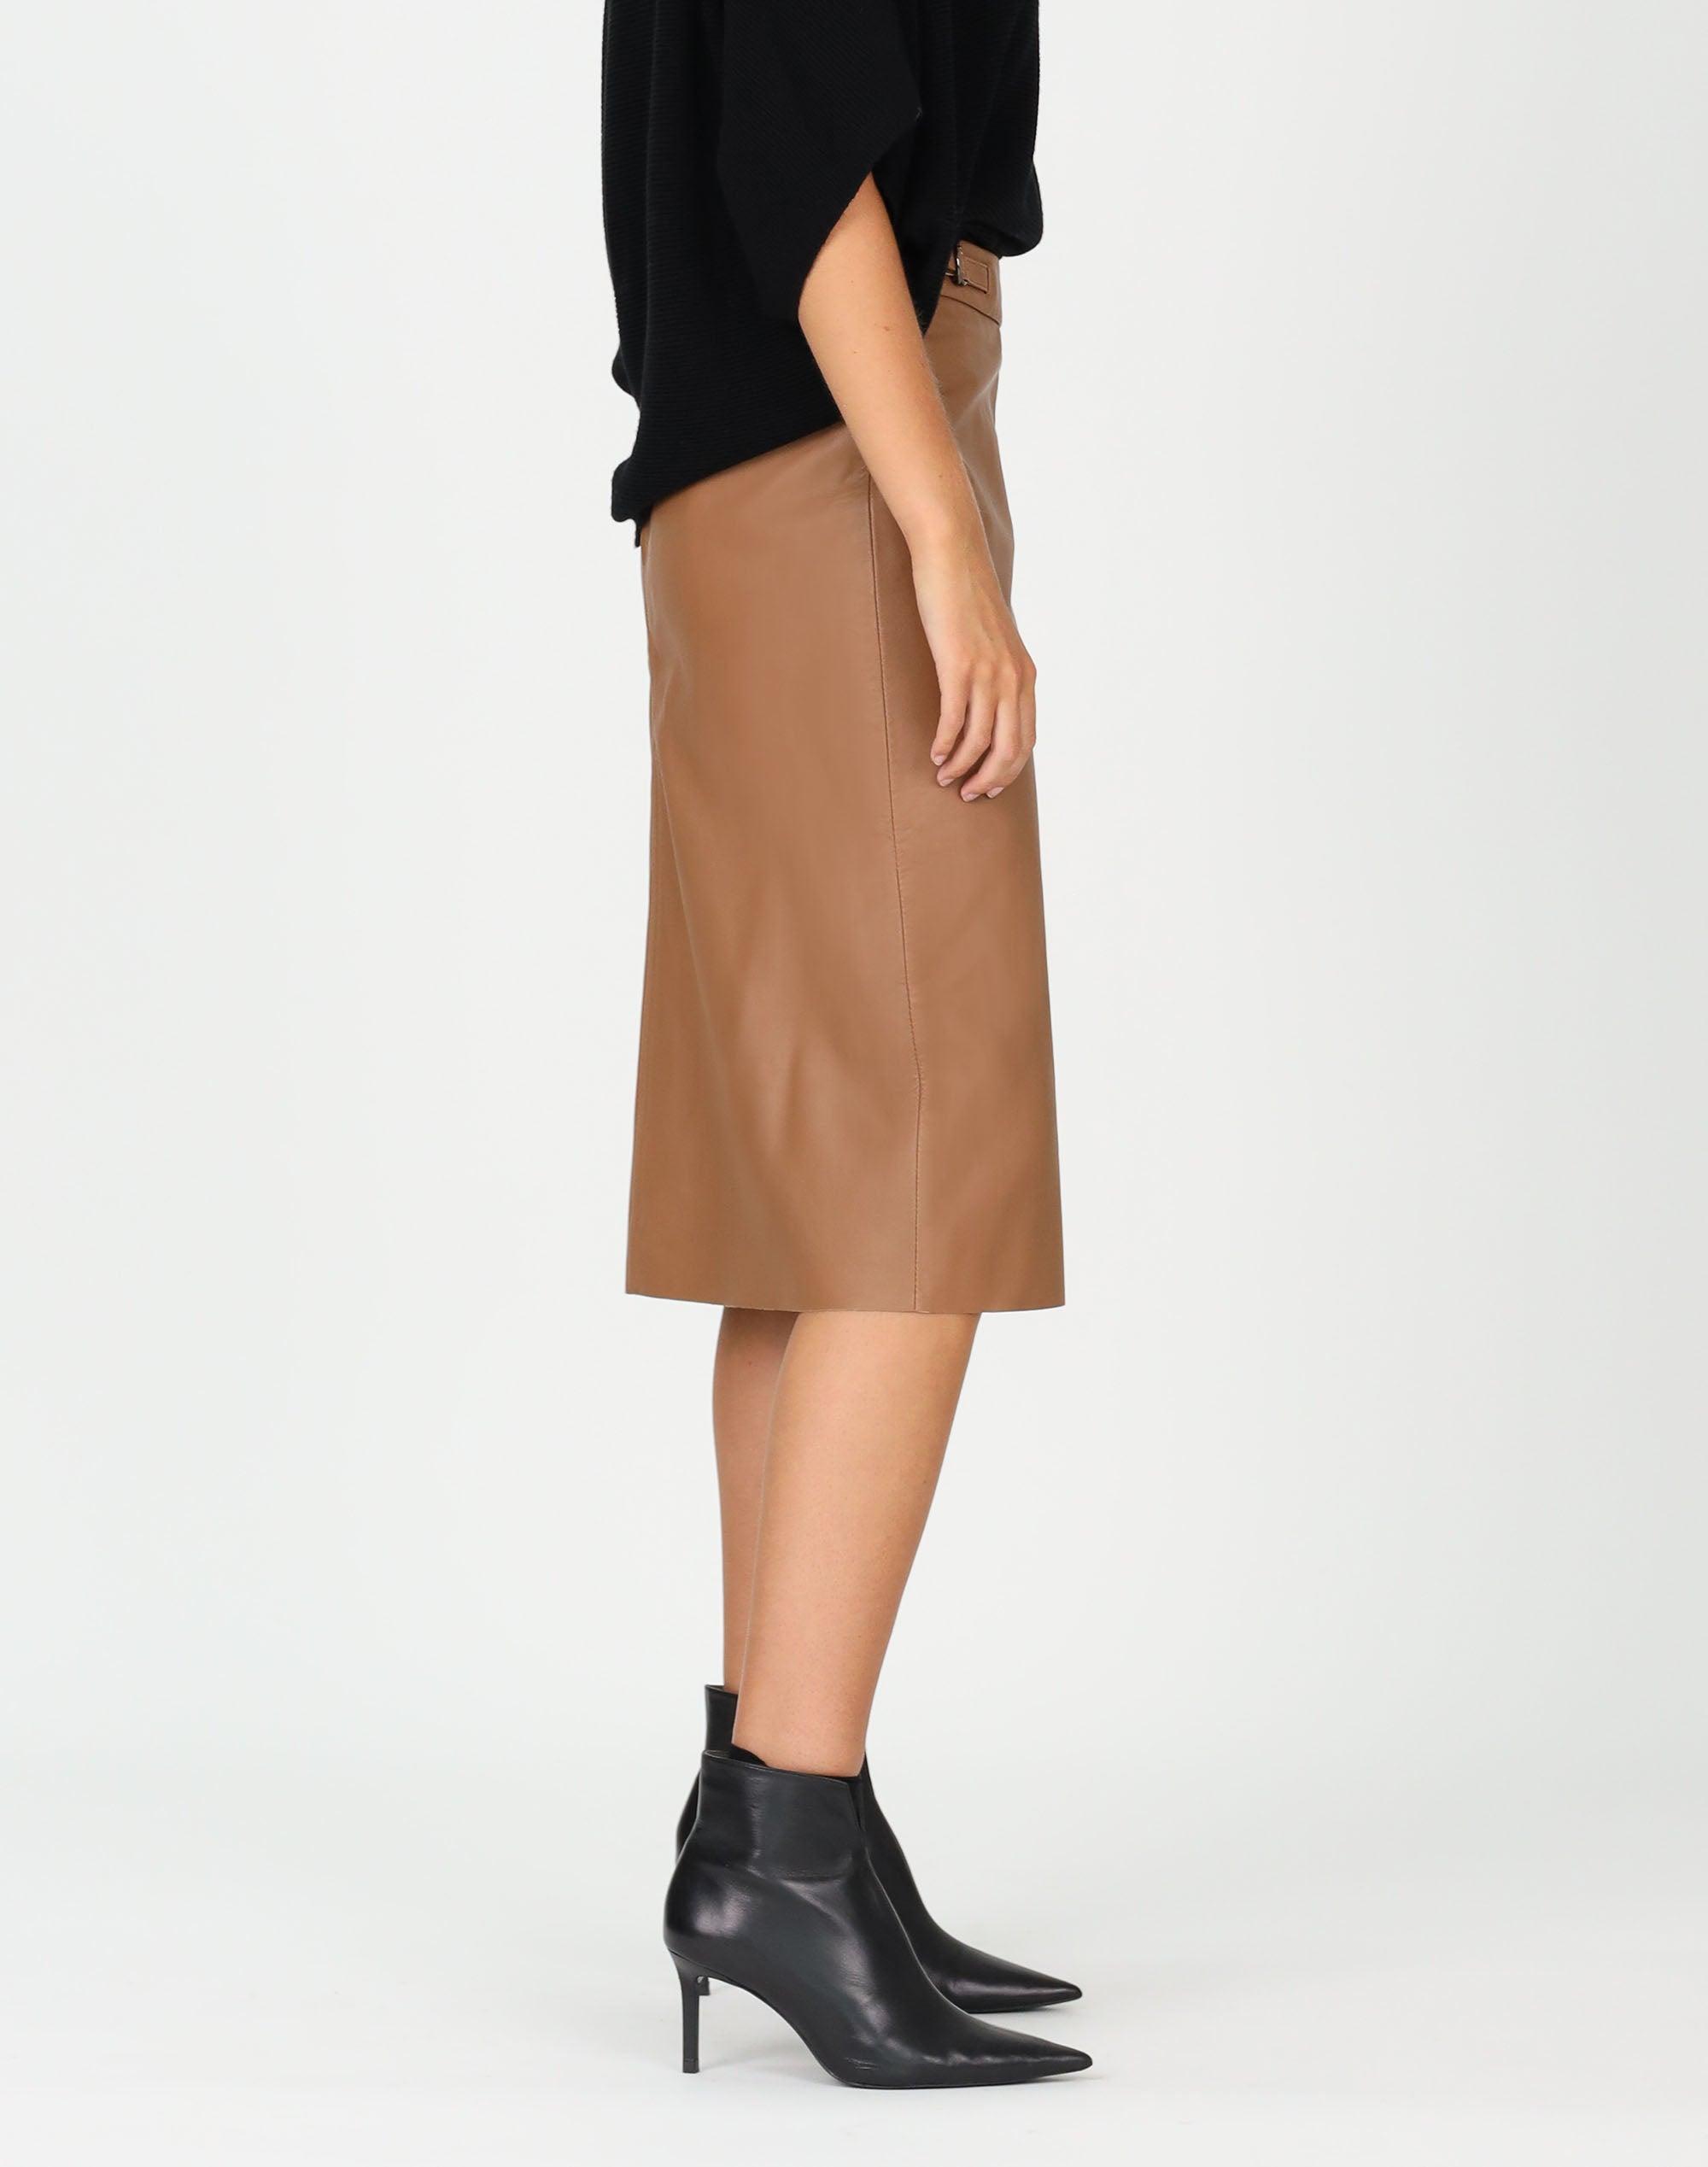 Tab Detail Leather Skirt